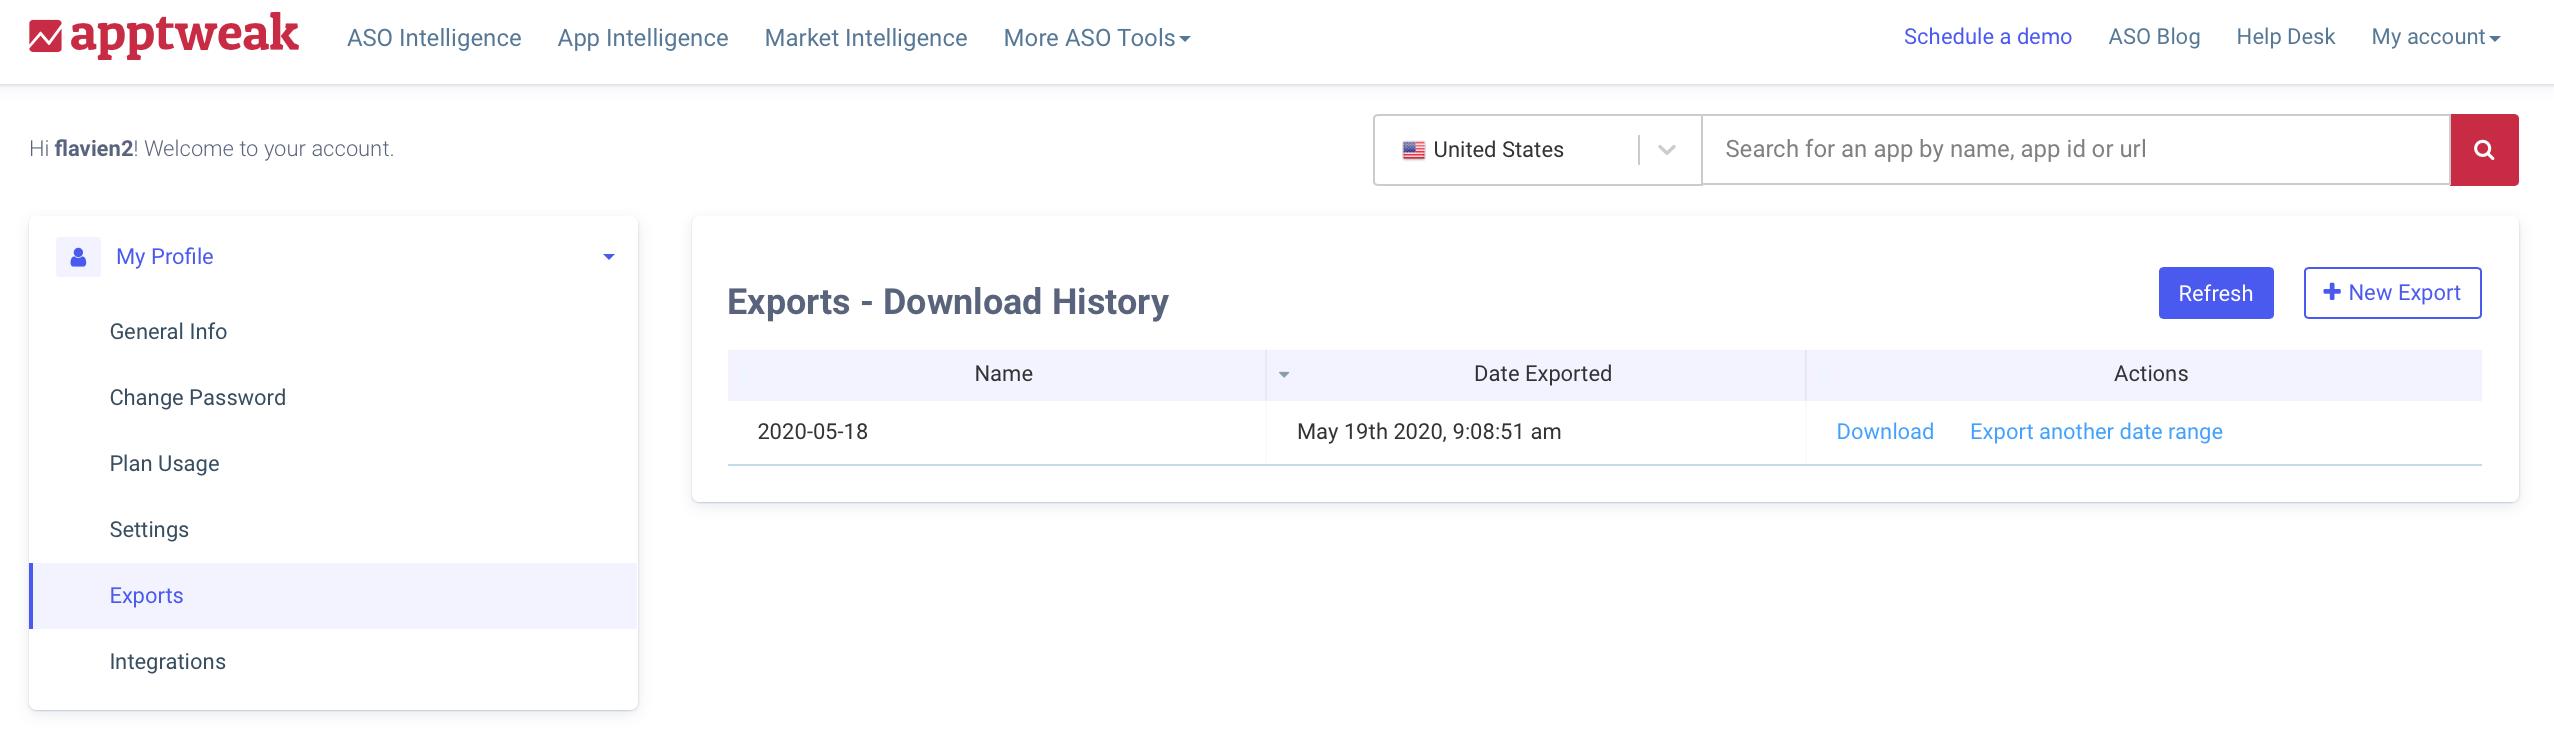 AppTweak ASO Tool: Export interface